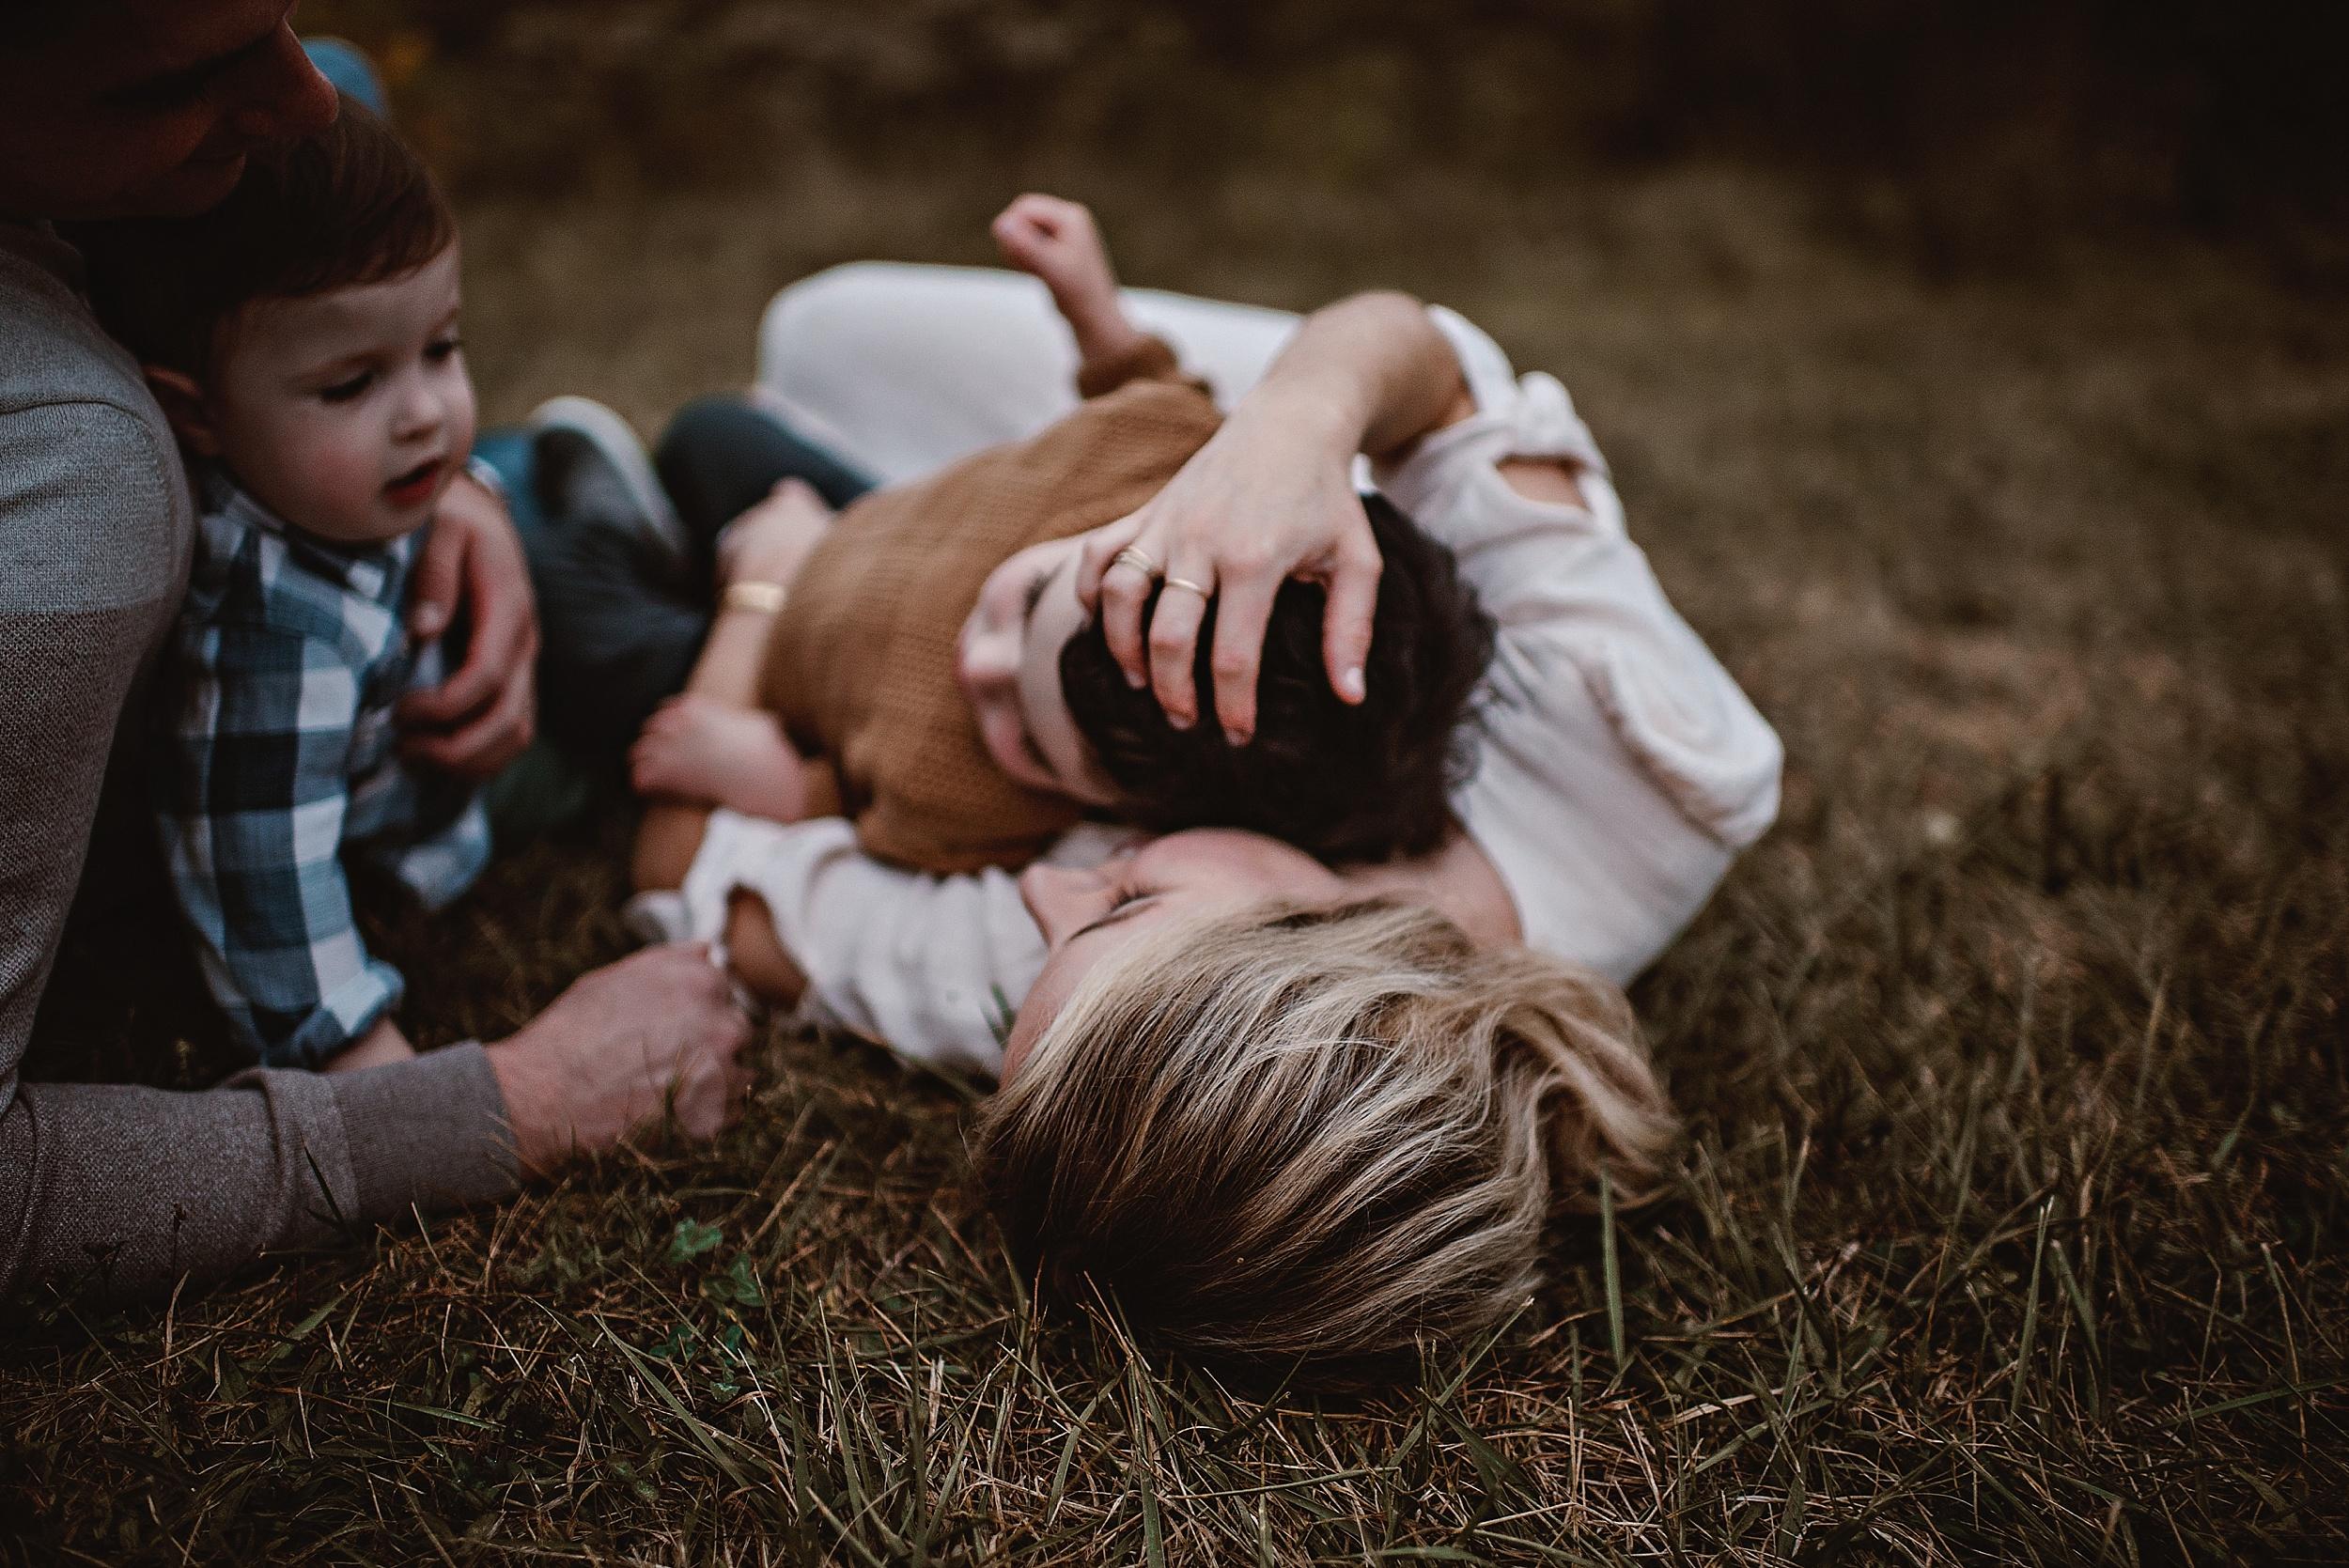 lauren-grayson-photography-portrait-artist-akron-cleveland-ohio-photographer-family-session-fields-sunset-fall_0212.jpg